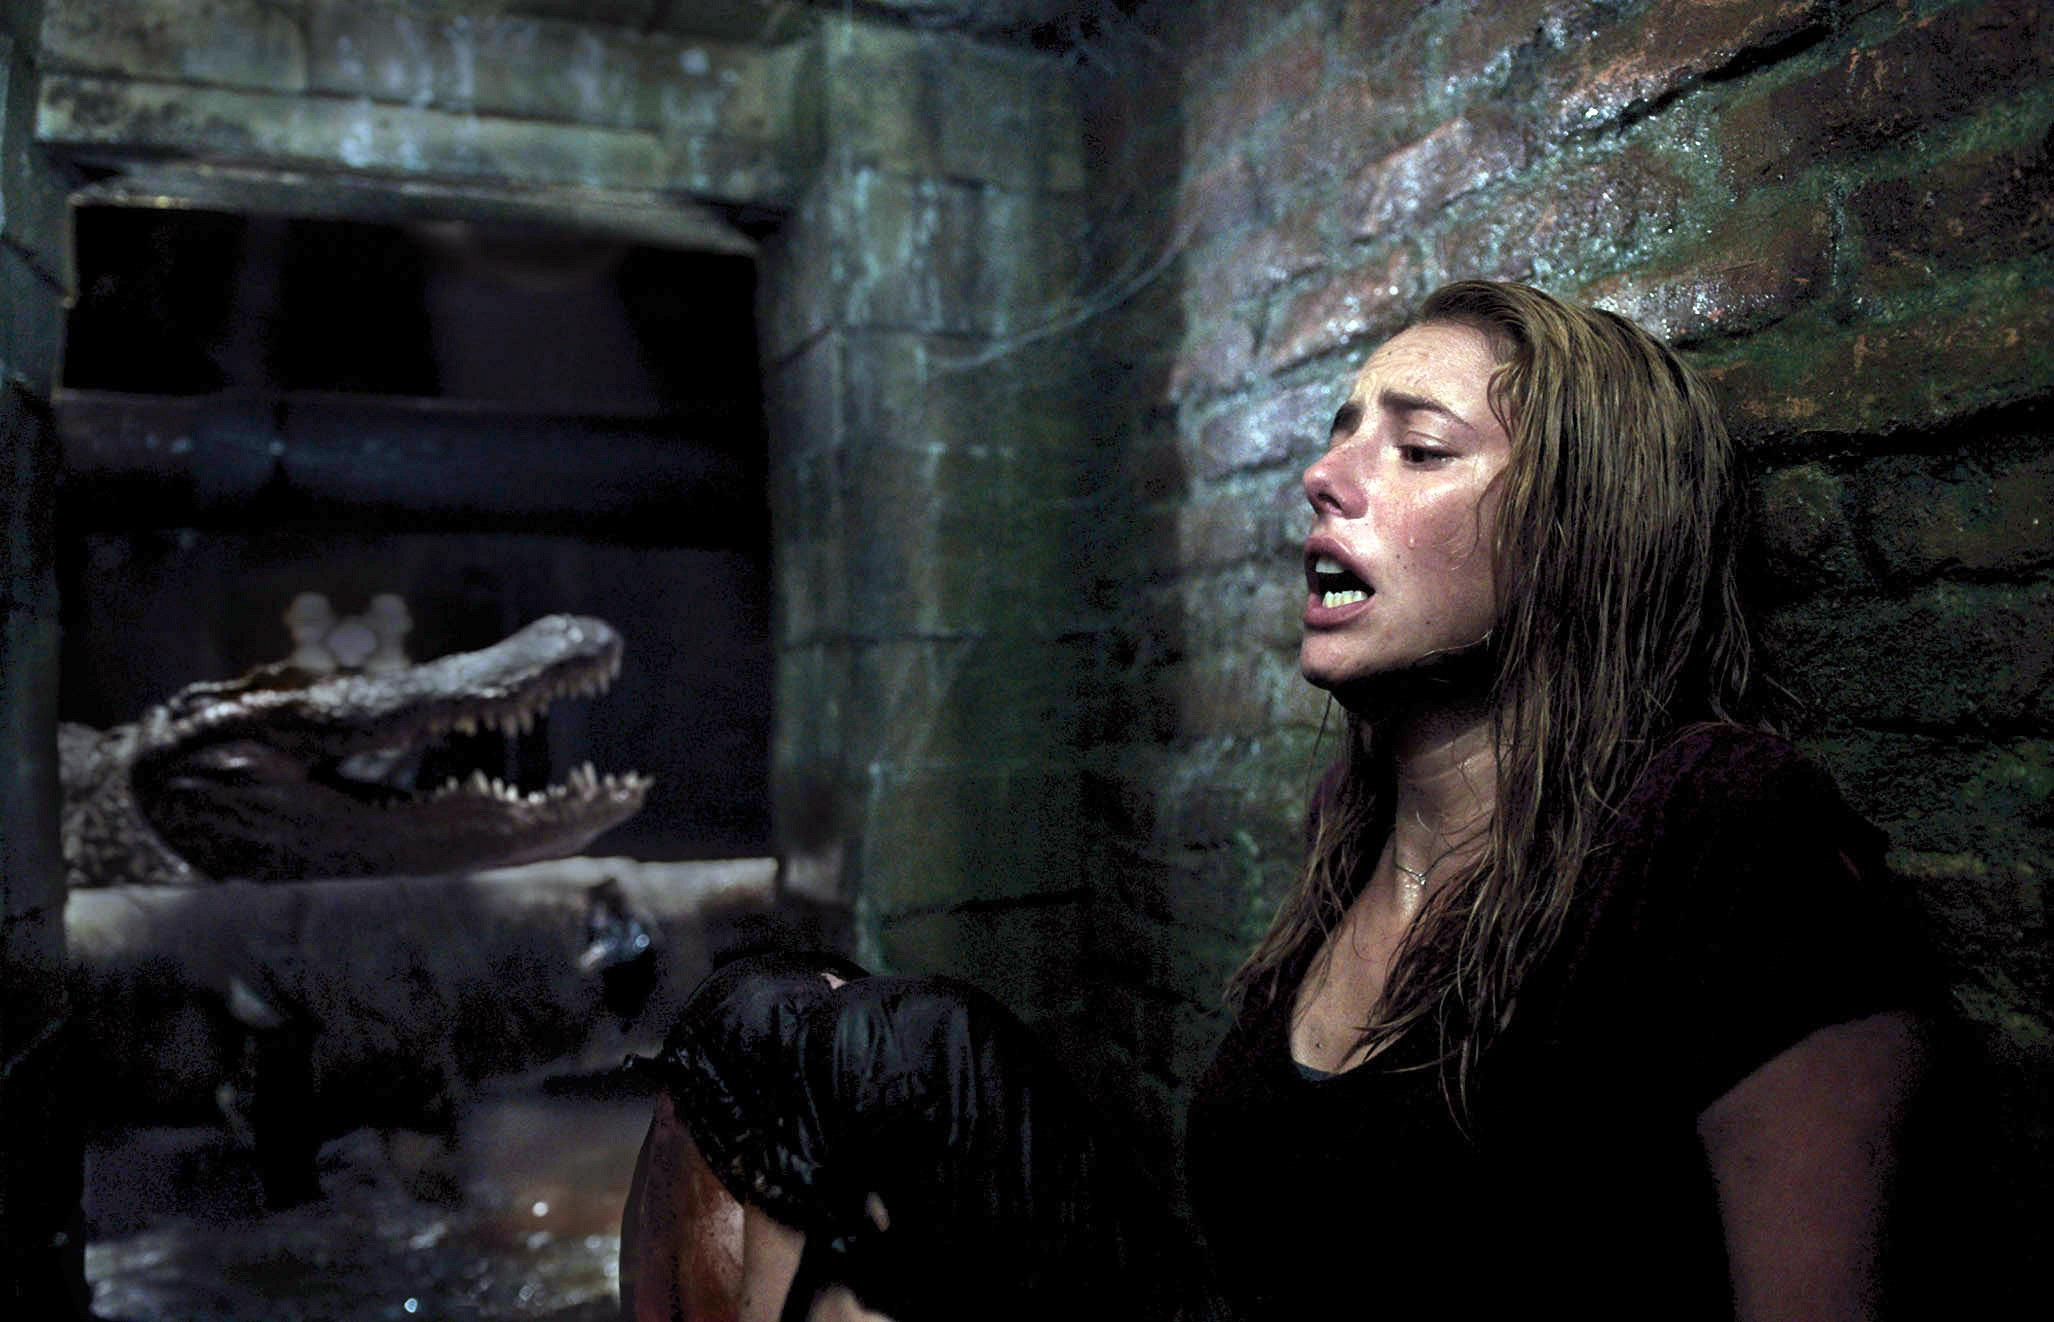 Kaya Scodelario win an alligator swimming near her